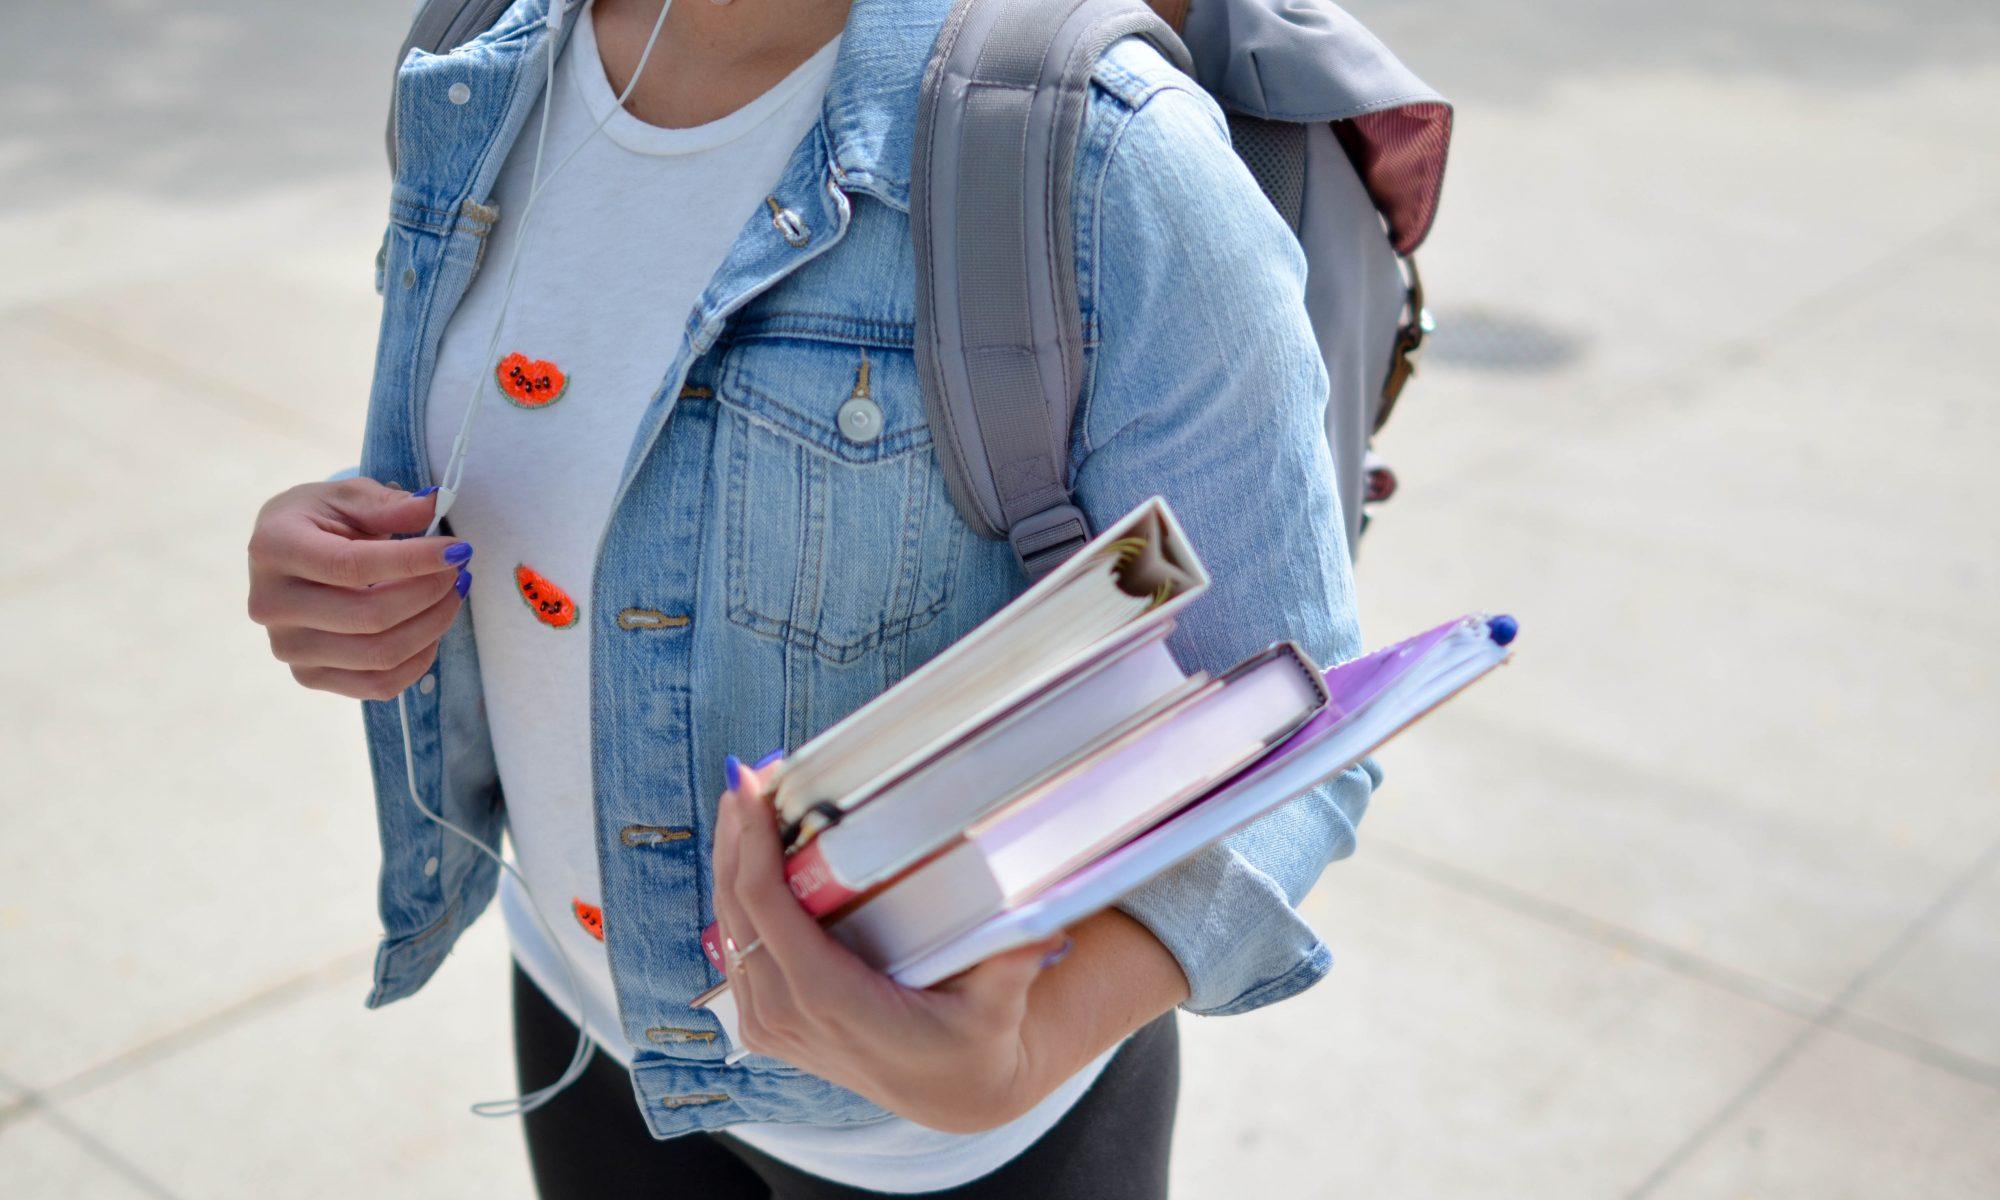 Overcoming Adversity Scholarship